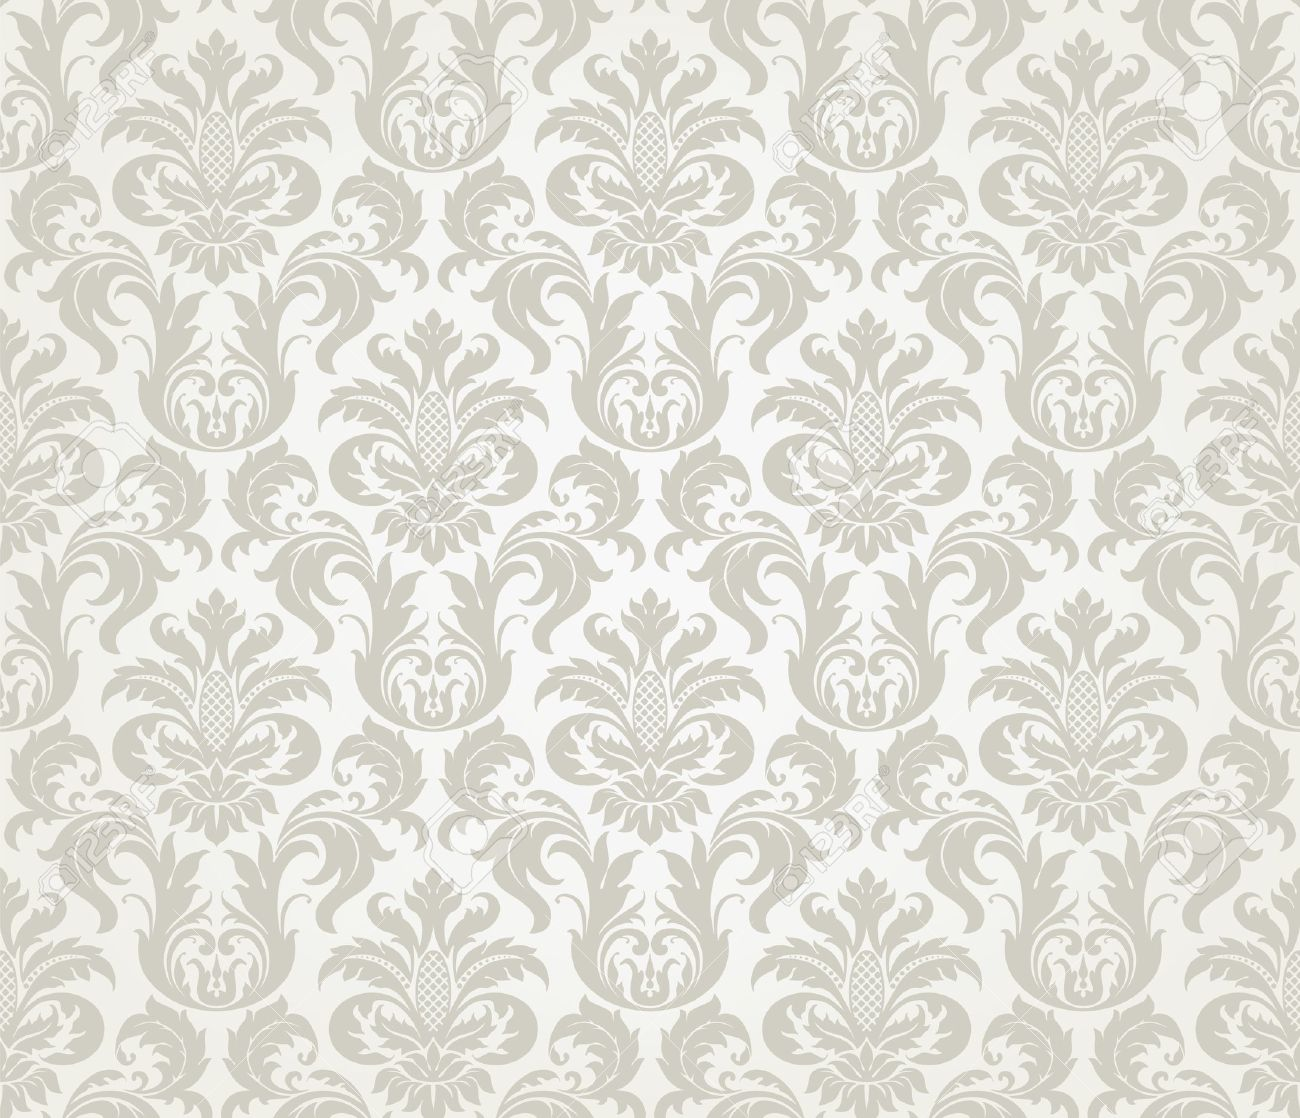 Wedding Website Background Patterns | Background Editing PicsArt